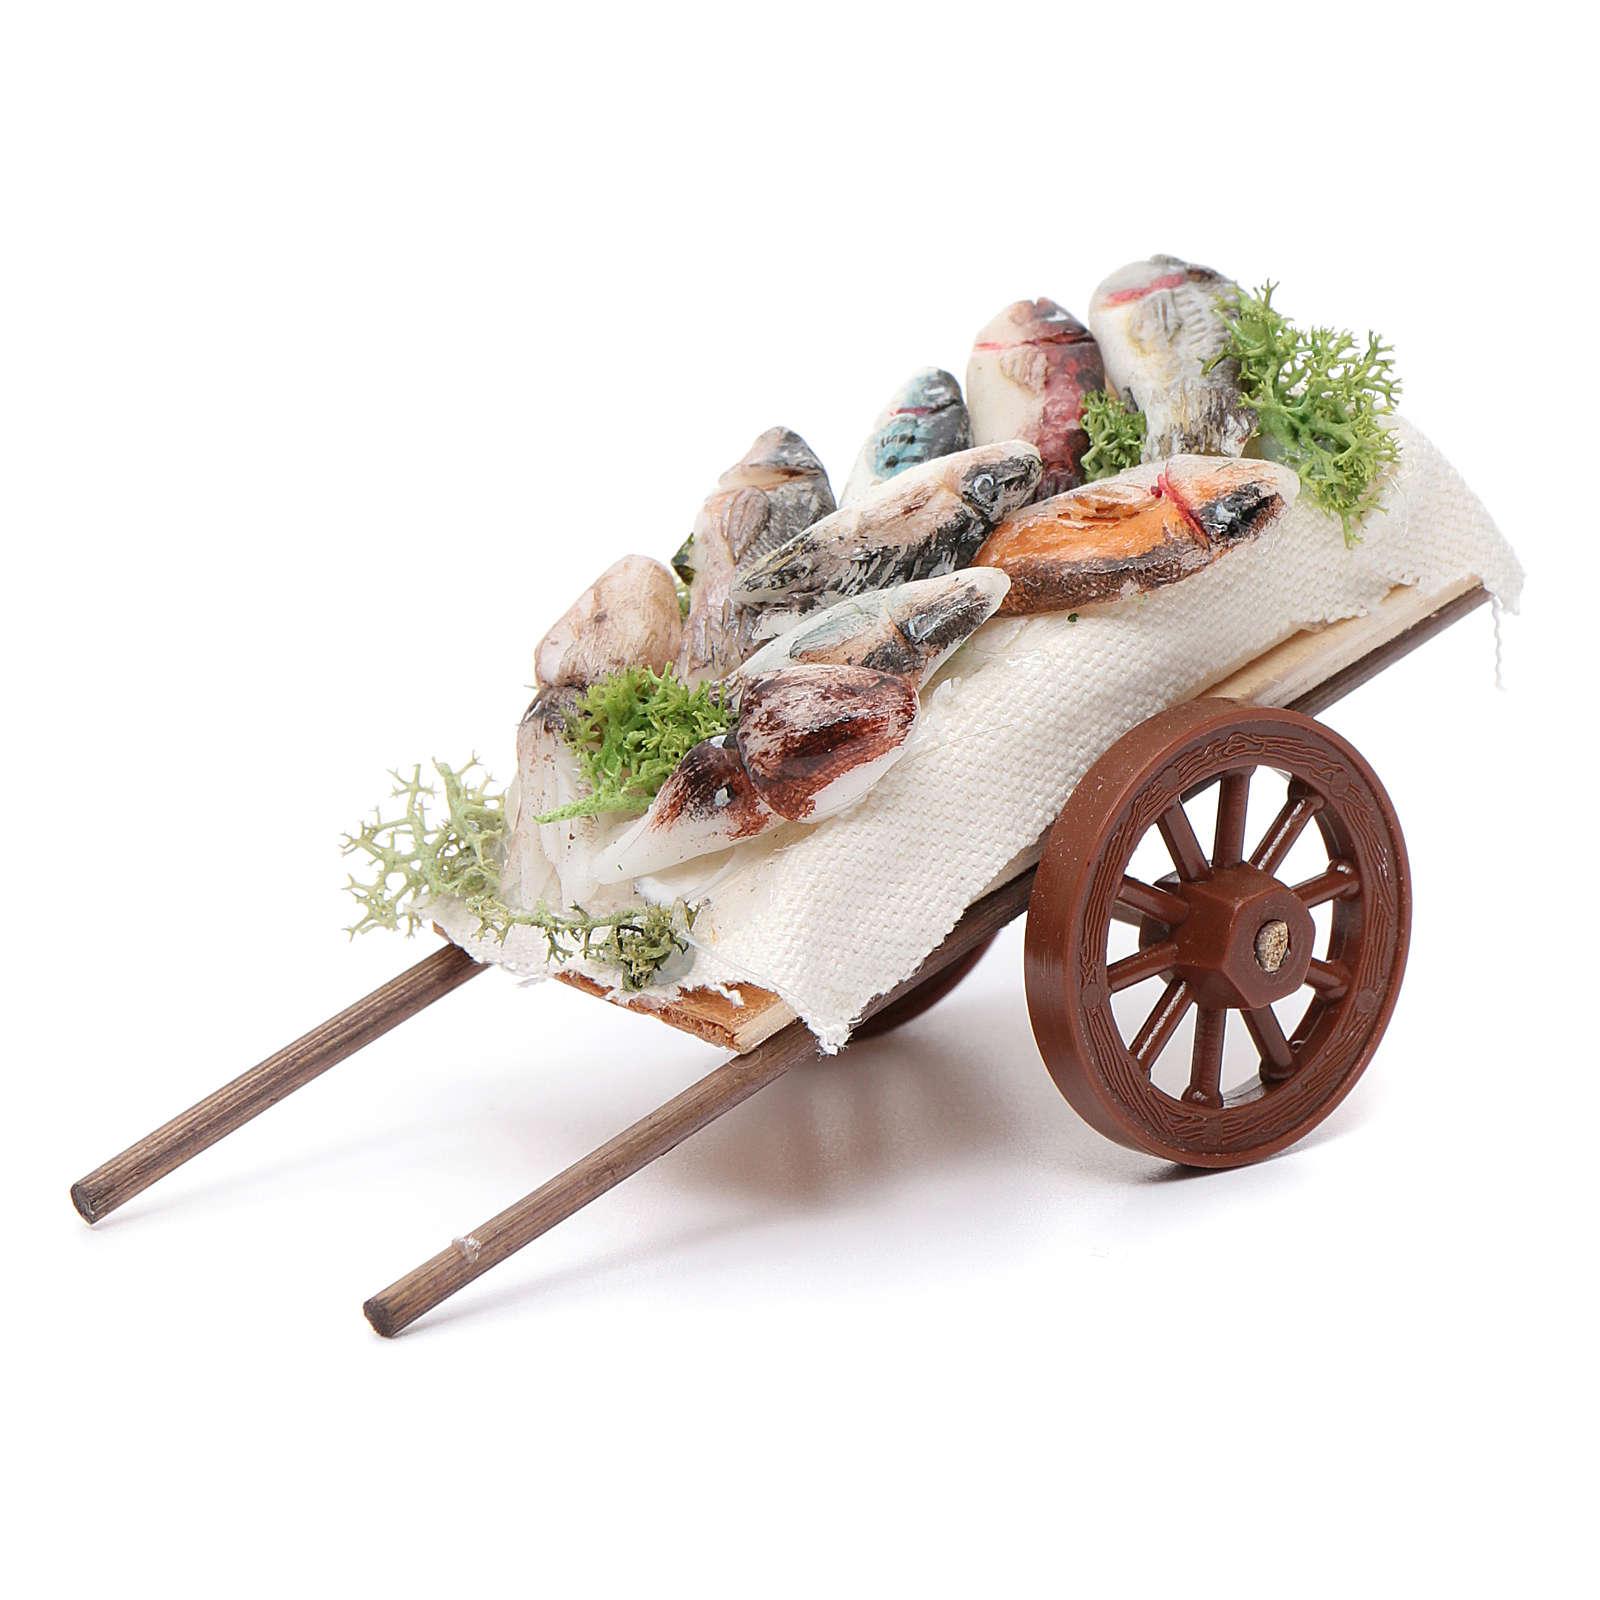 Neapolitan Nativity accessory, fishmonger's cart in wax 5x11x5cm 4